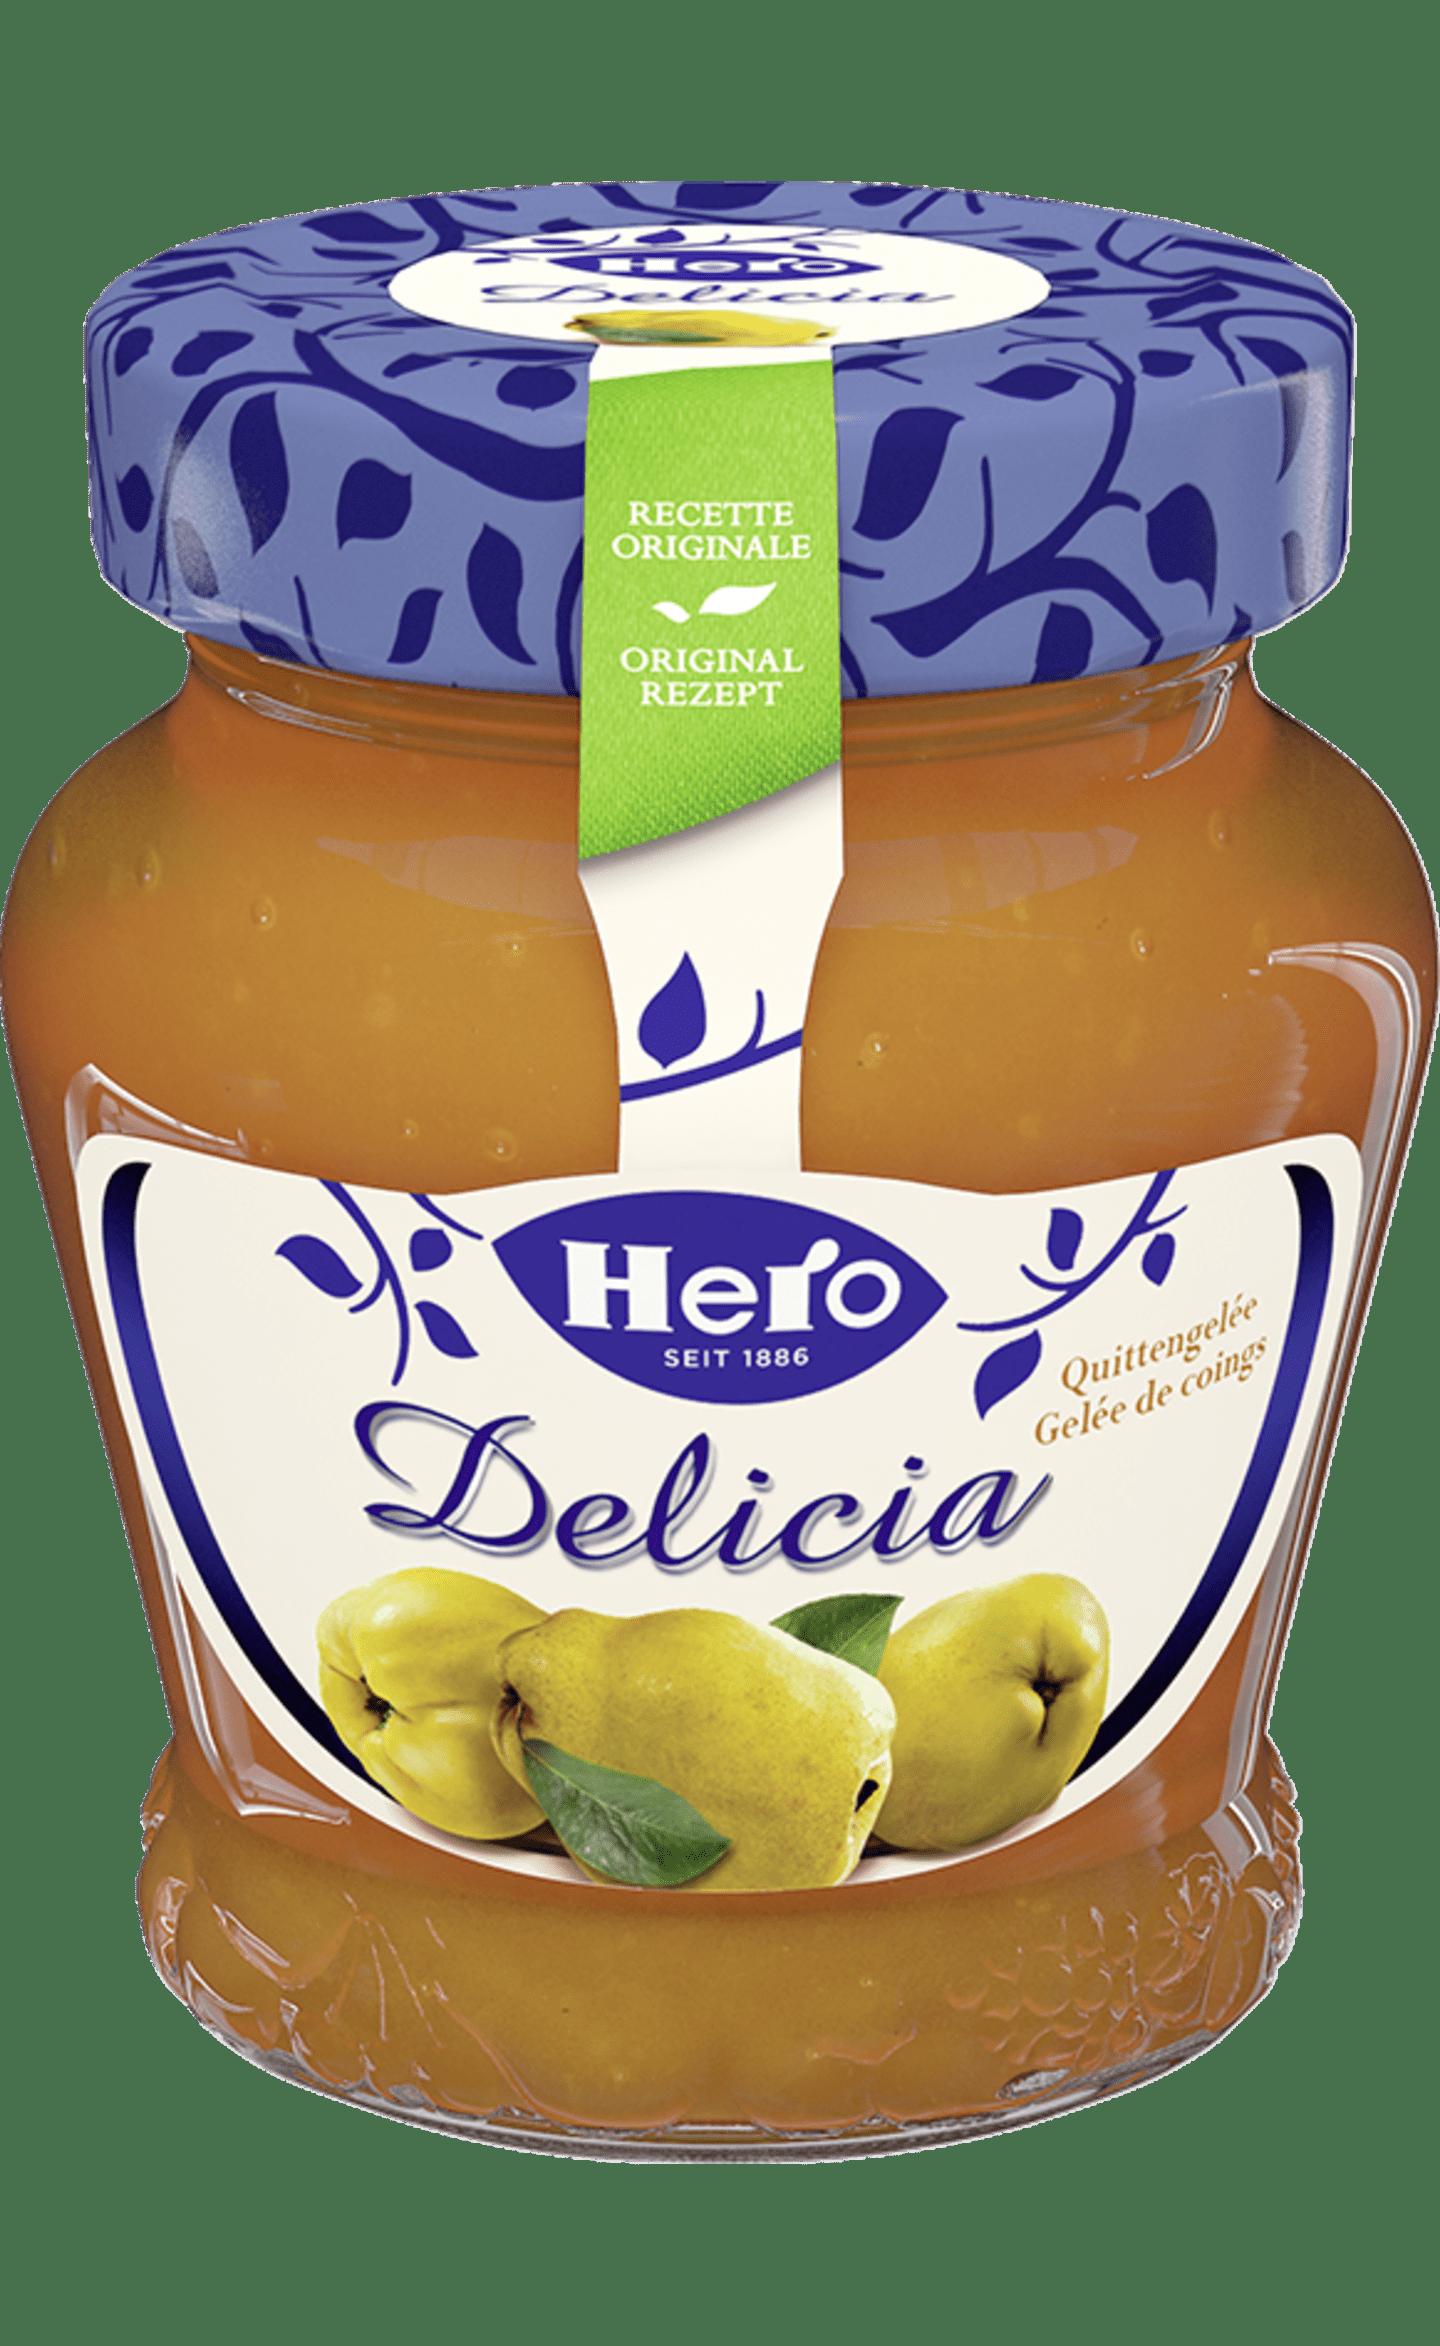 Hero Delicia Konfitüre | Quitte